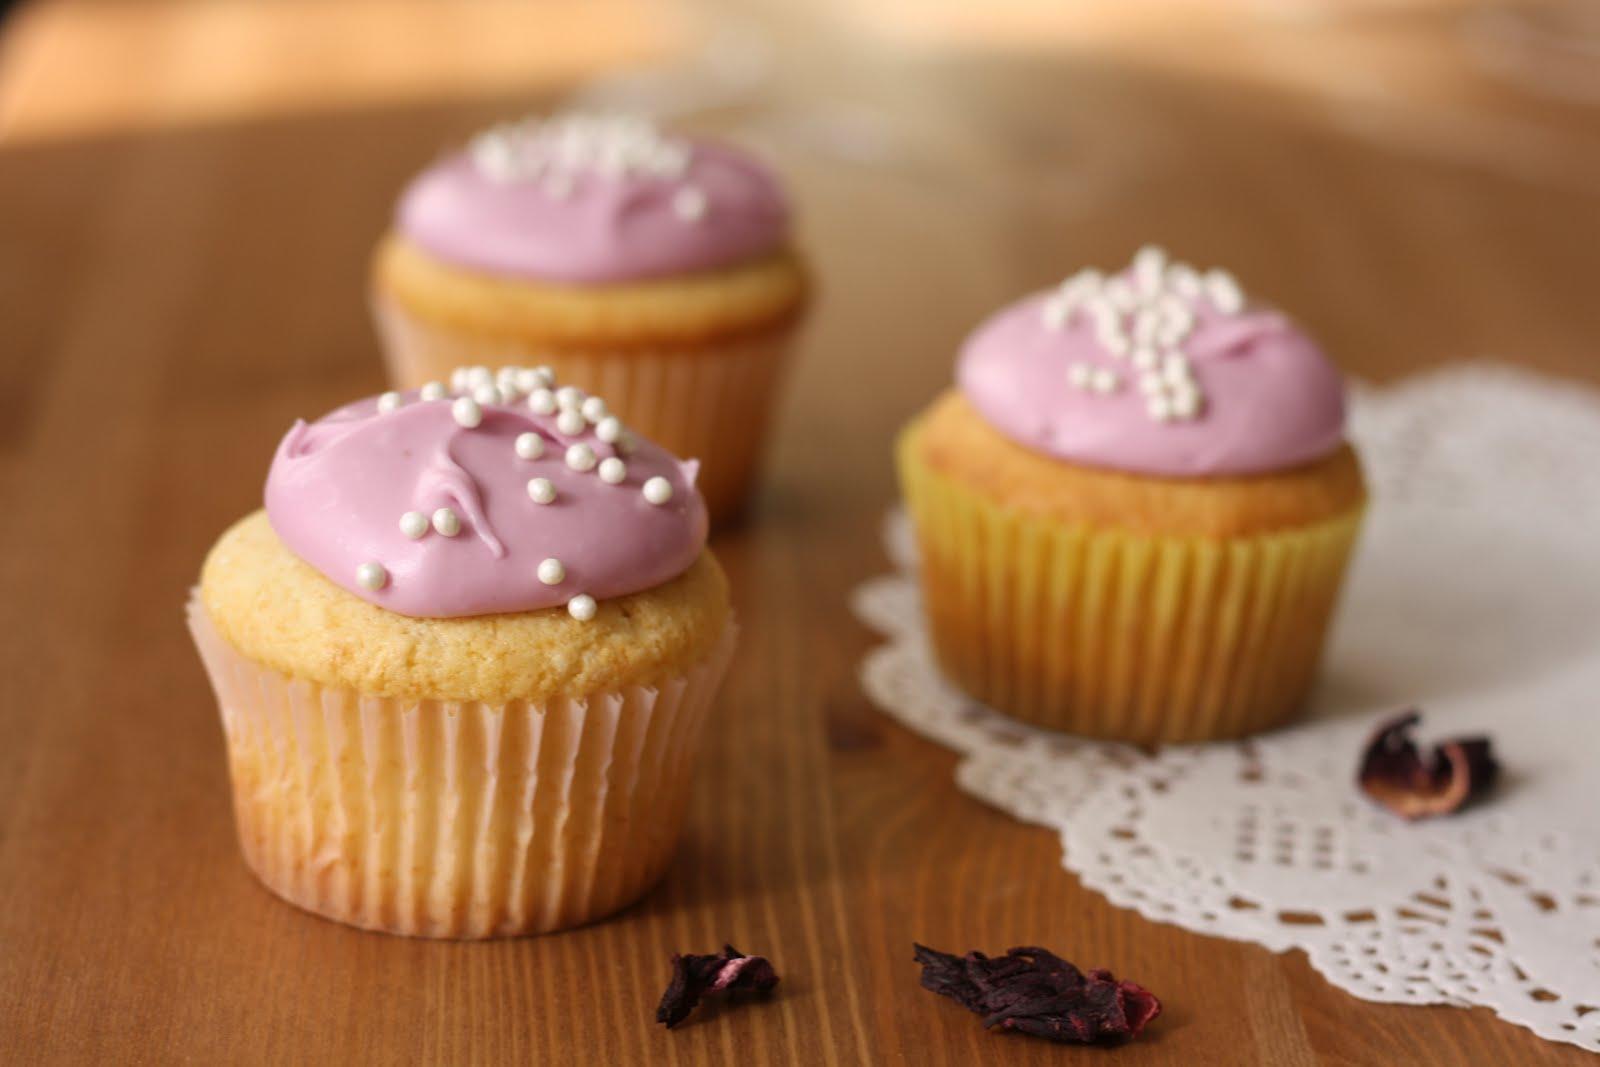 Hummingbird Bakery Lemon Cupcakes With Hibiscus Cream